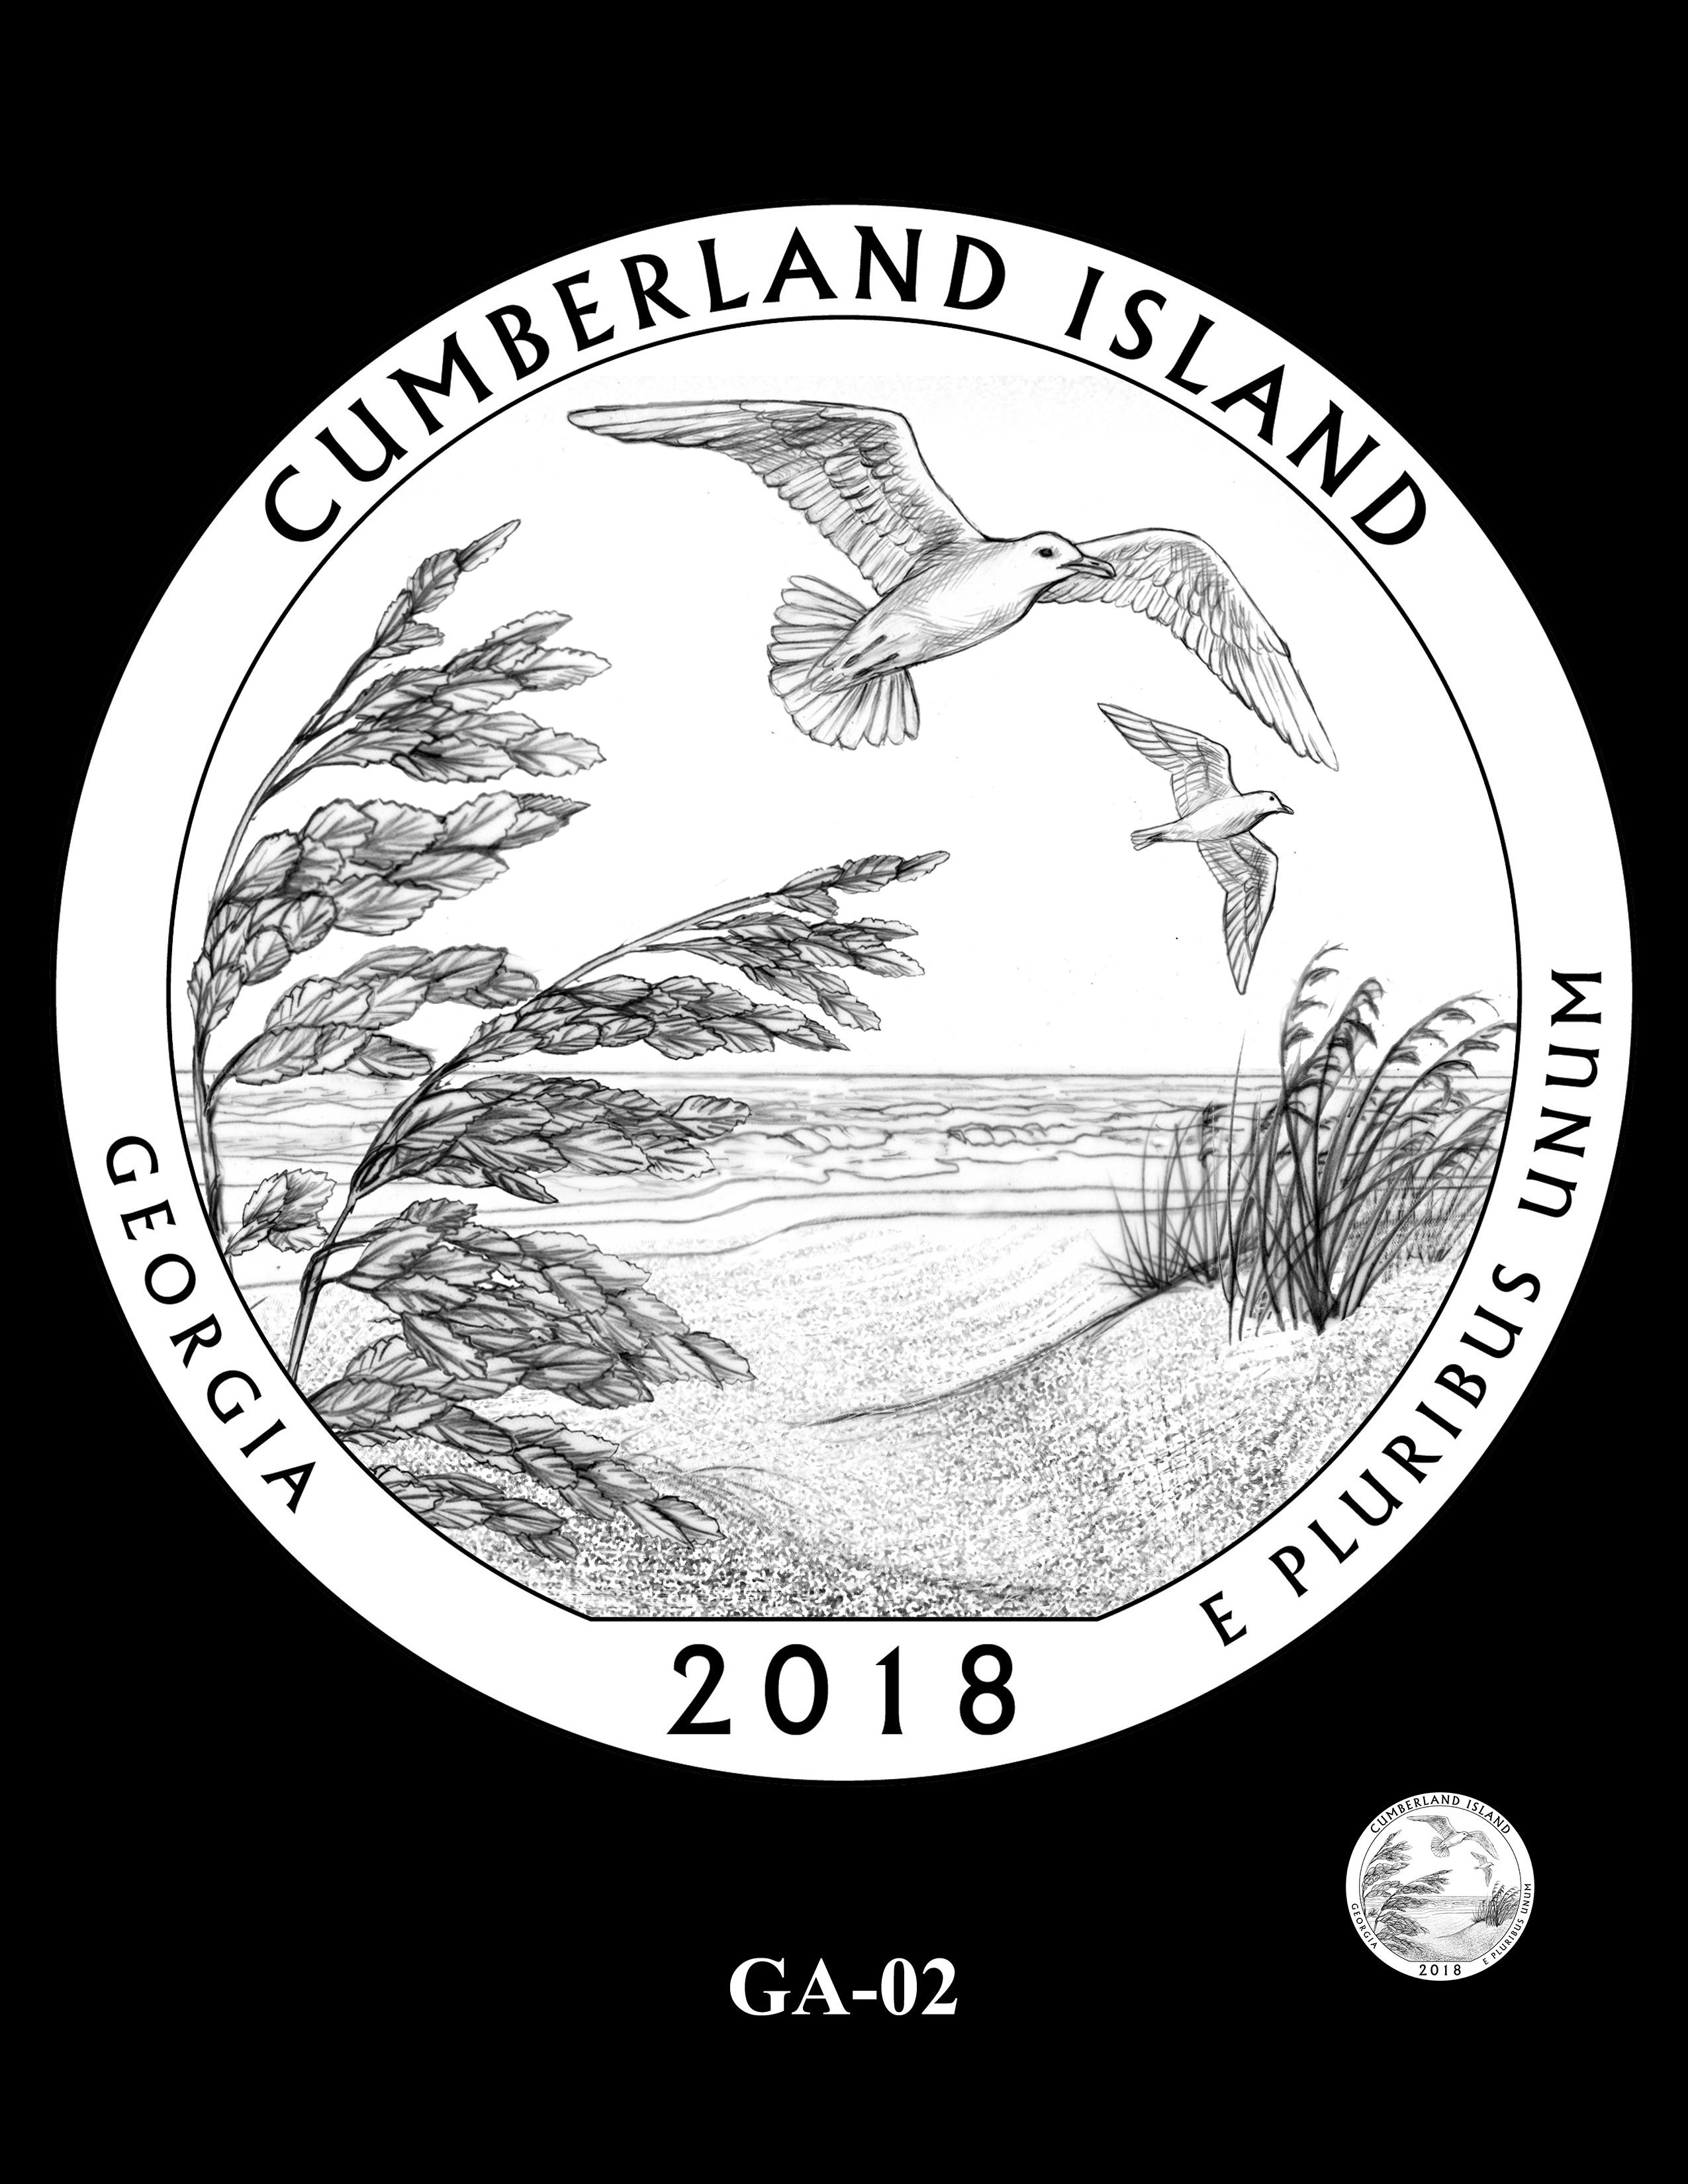 GA-02 -- 2018 America the Beautiful® Quarters Program